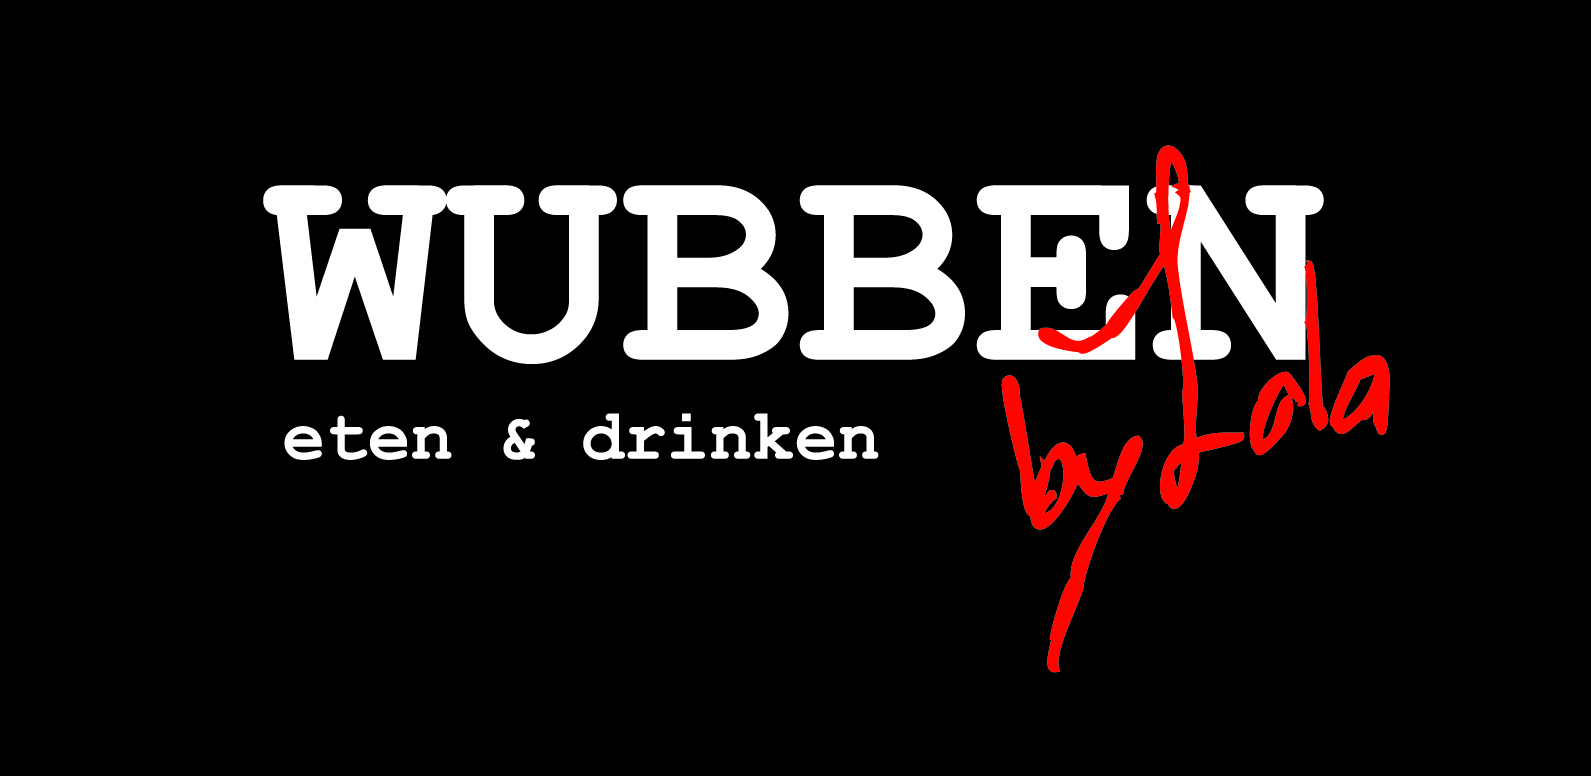 Wubben by Lola